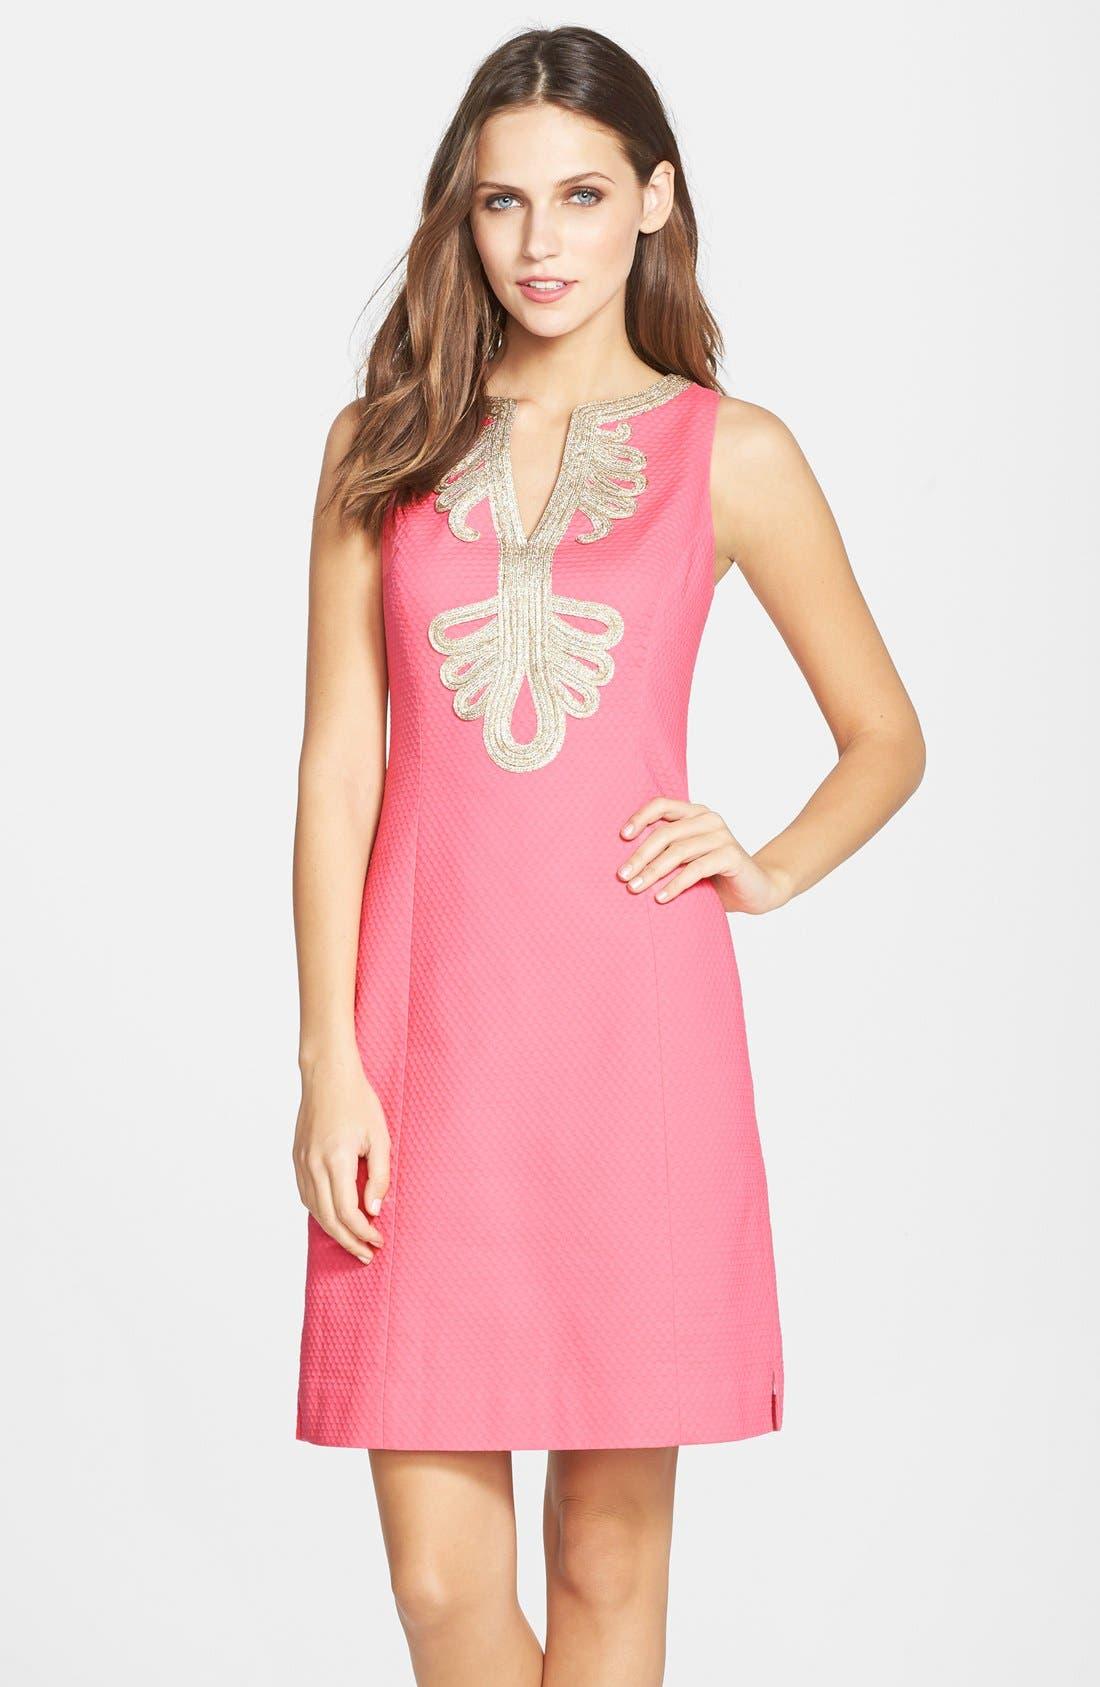 Main Image - Lilly Pulitzer® 'Janice' Soutache Trim Shift Dress